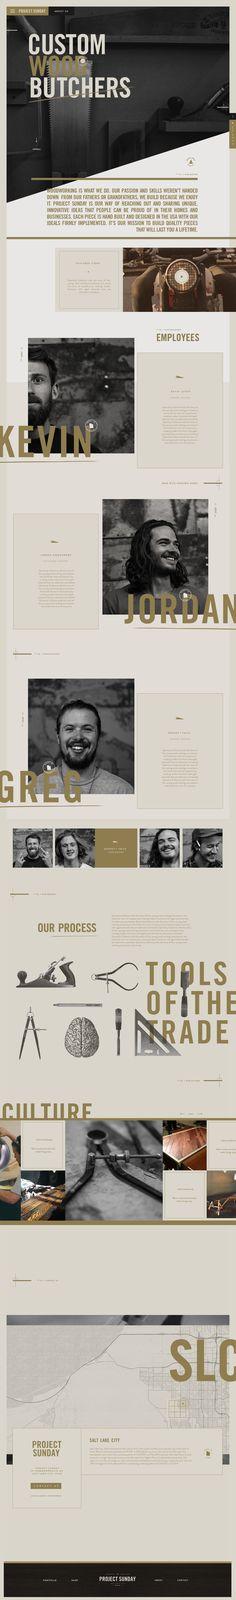 by Nick Franchi - Landingpage 3 Webdesign Inspiration, Website Design Inspiration, Layout Inspiration, Graphic Design Inspiration, Interface Web, Interface Design, Web Layout, Layout Design, Ui Design